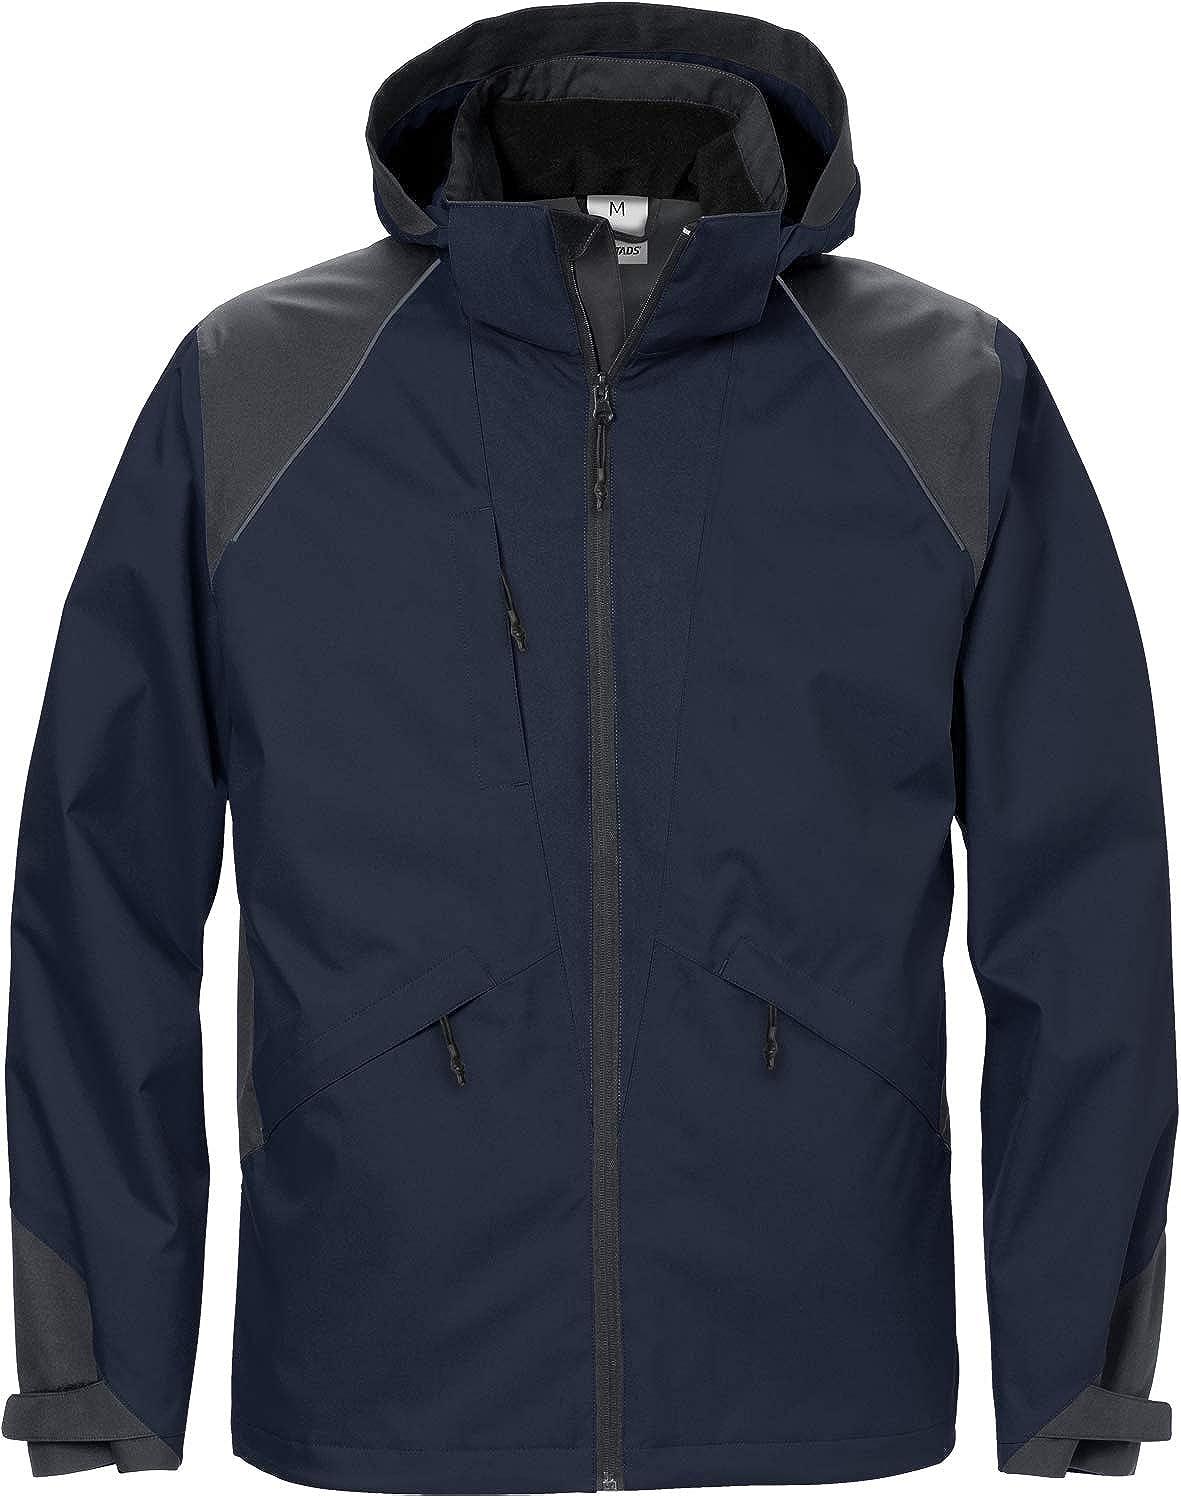 Fristads Workwear 124875 Mens Shell Jacket